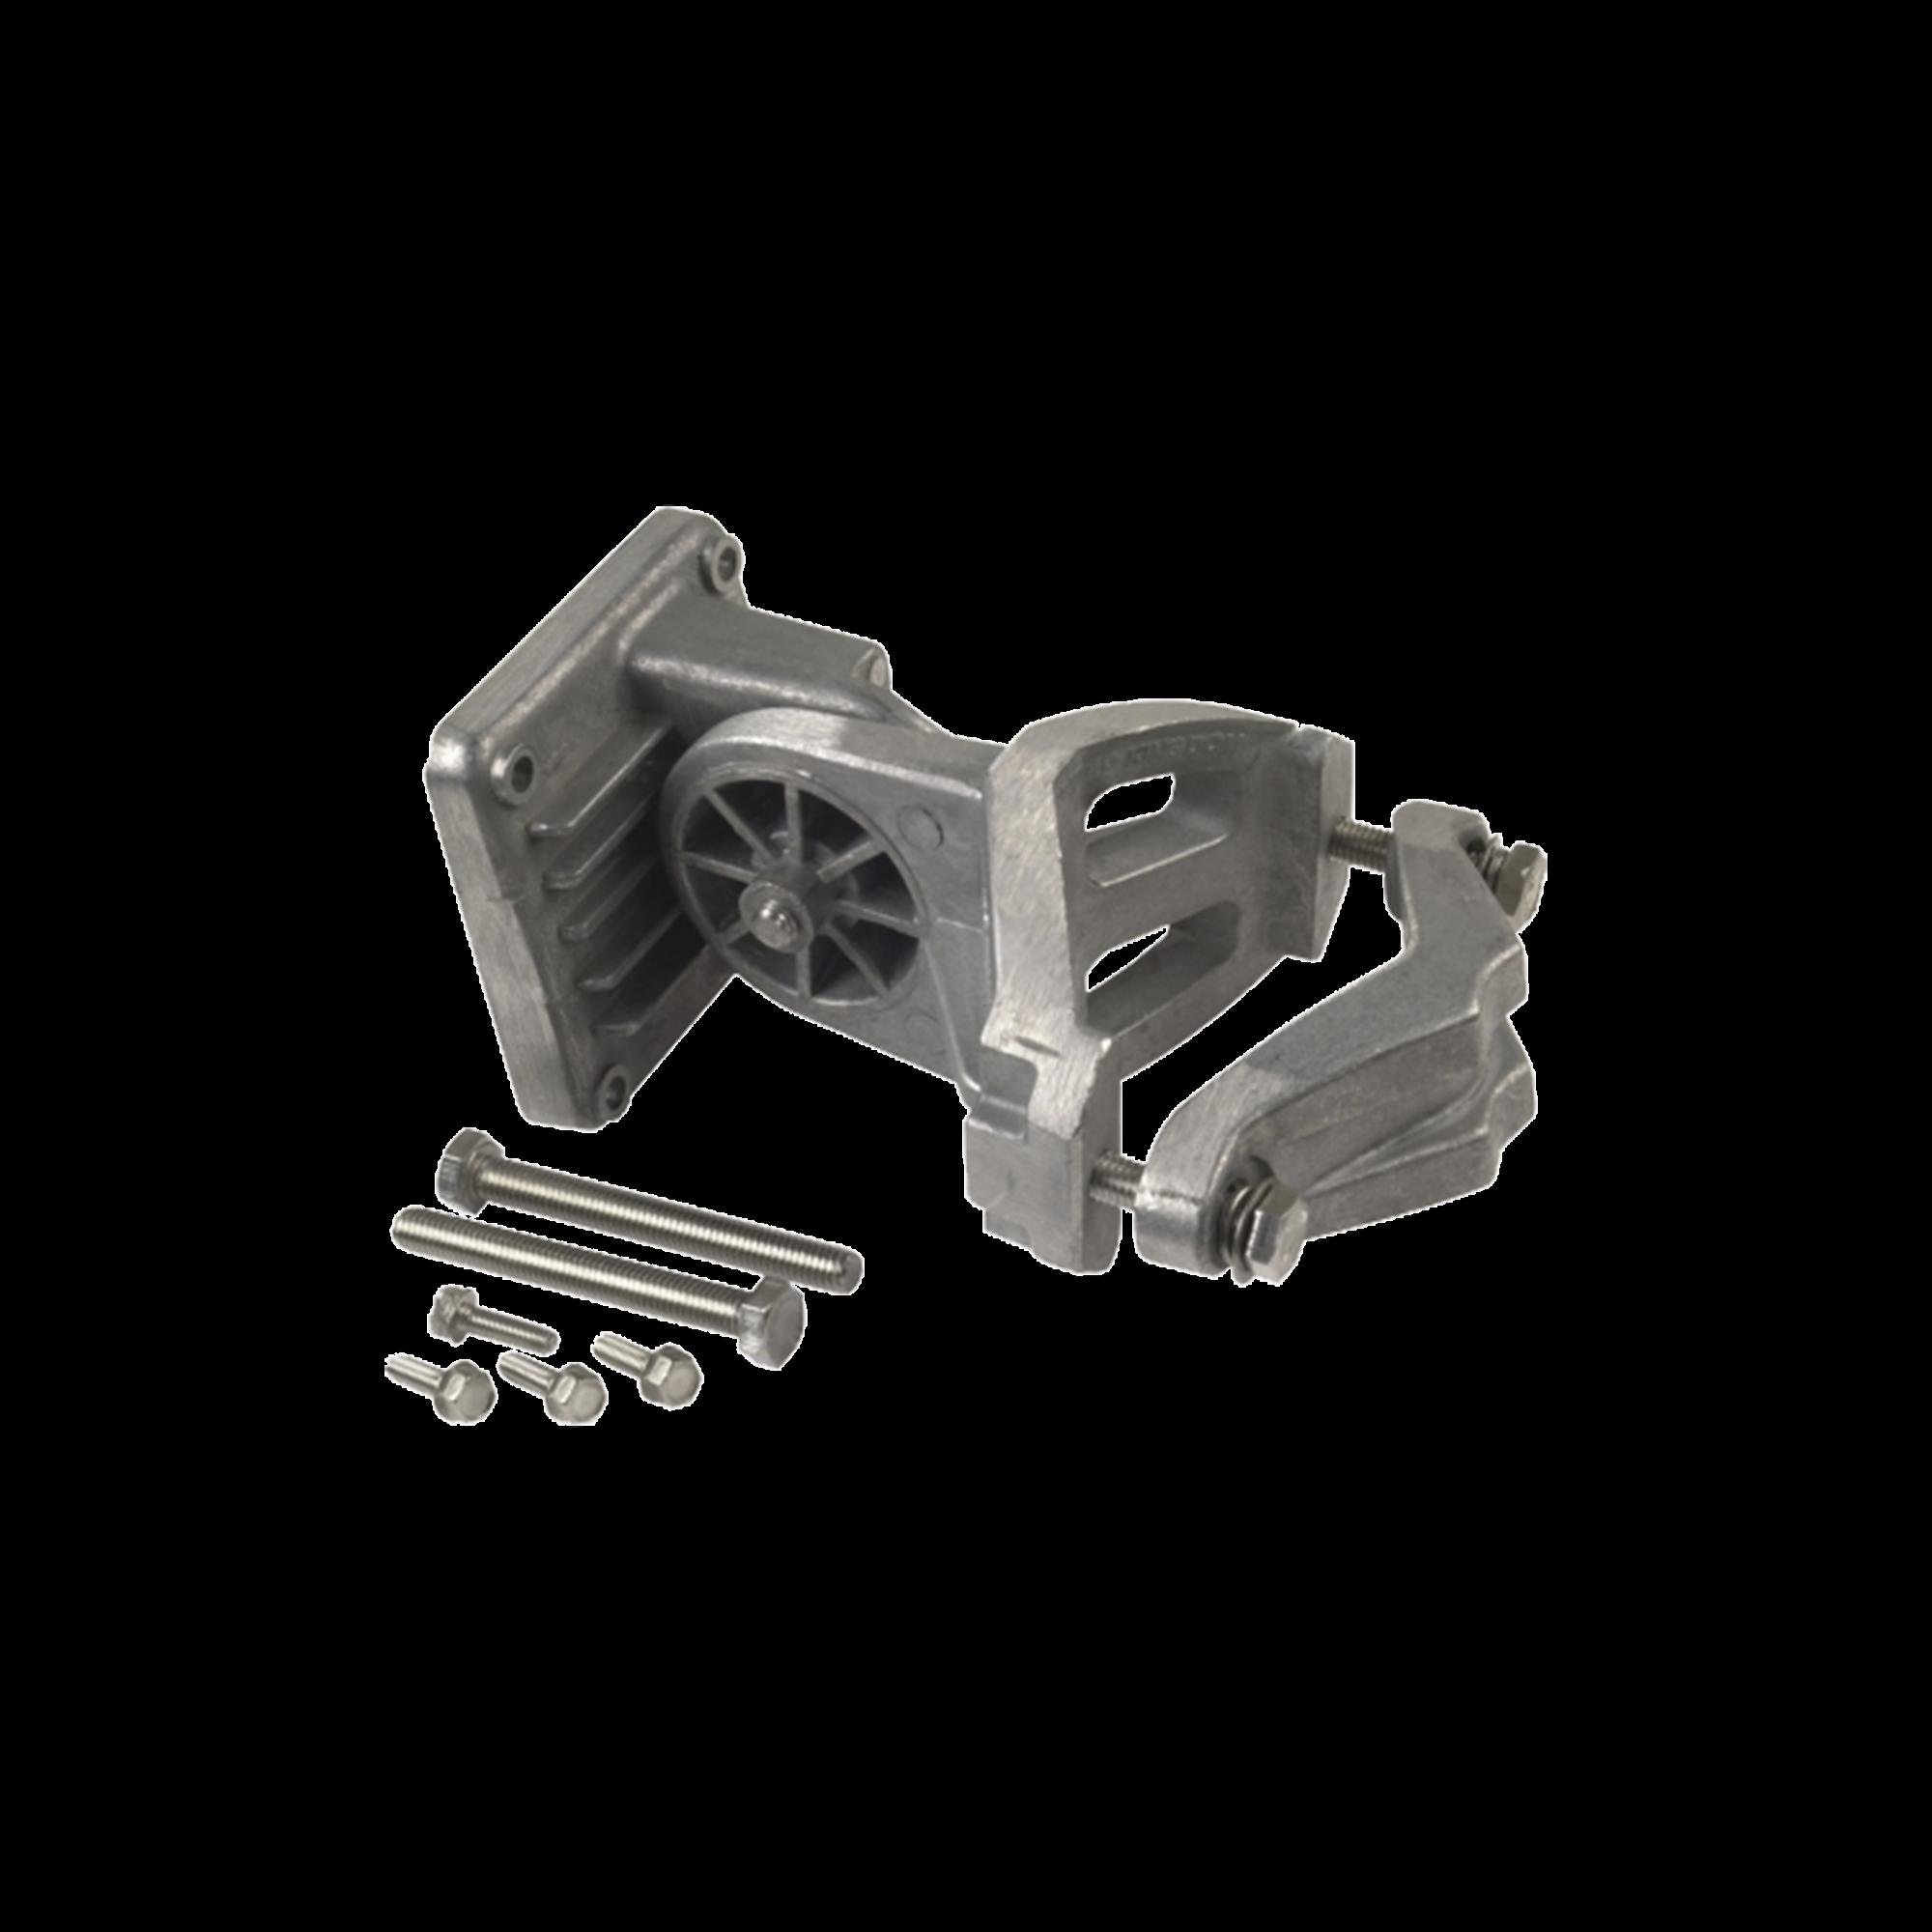 WB2289A - KIT D/MONTAJE P/PTP300/400/500/600